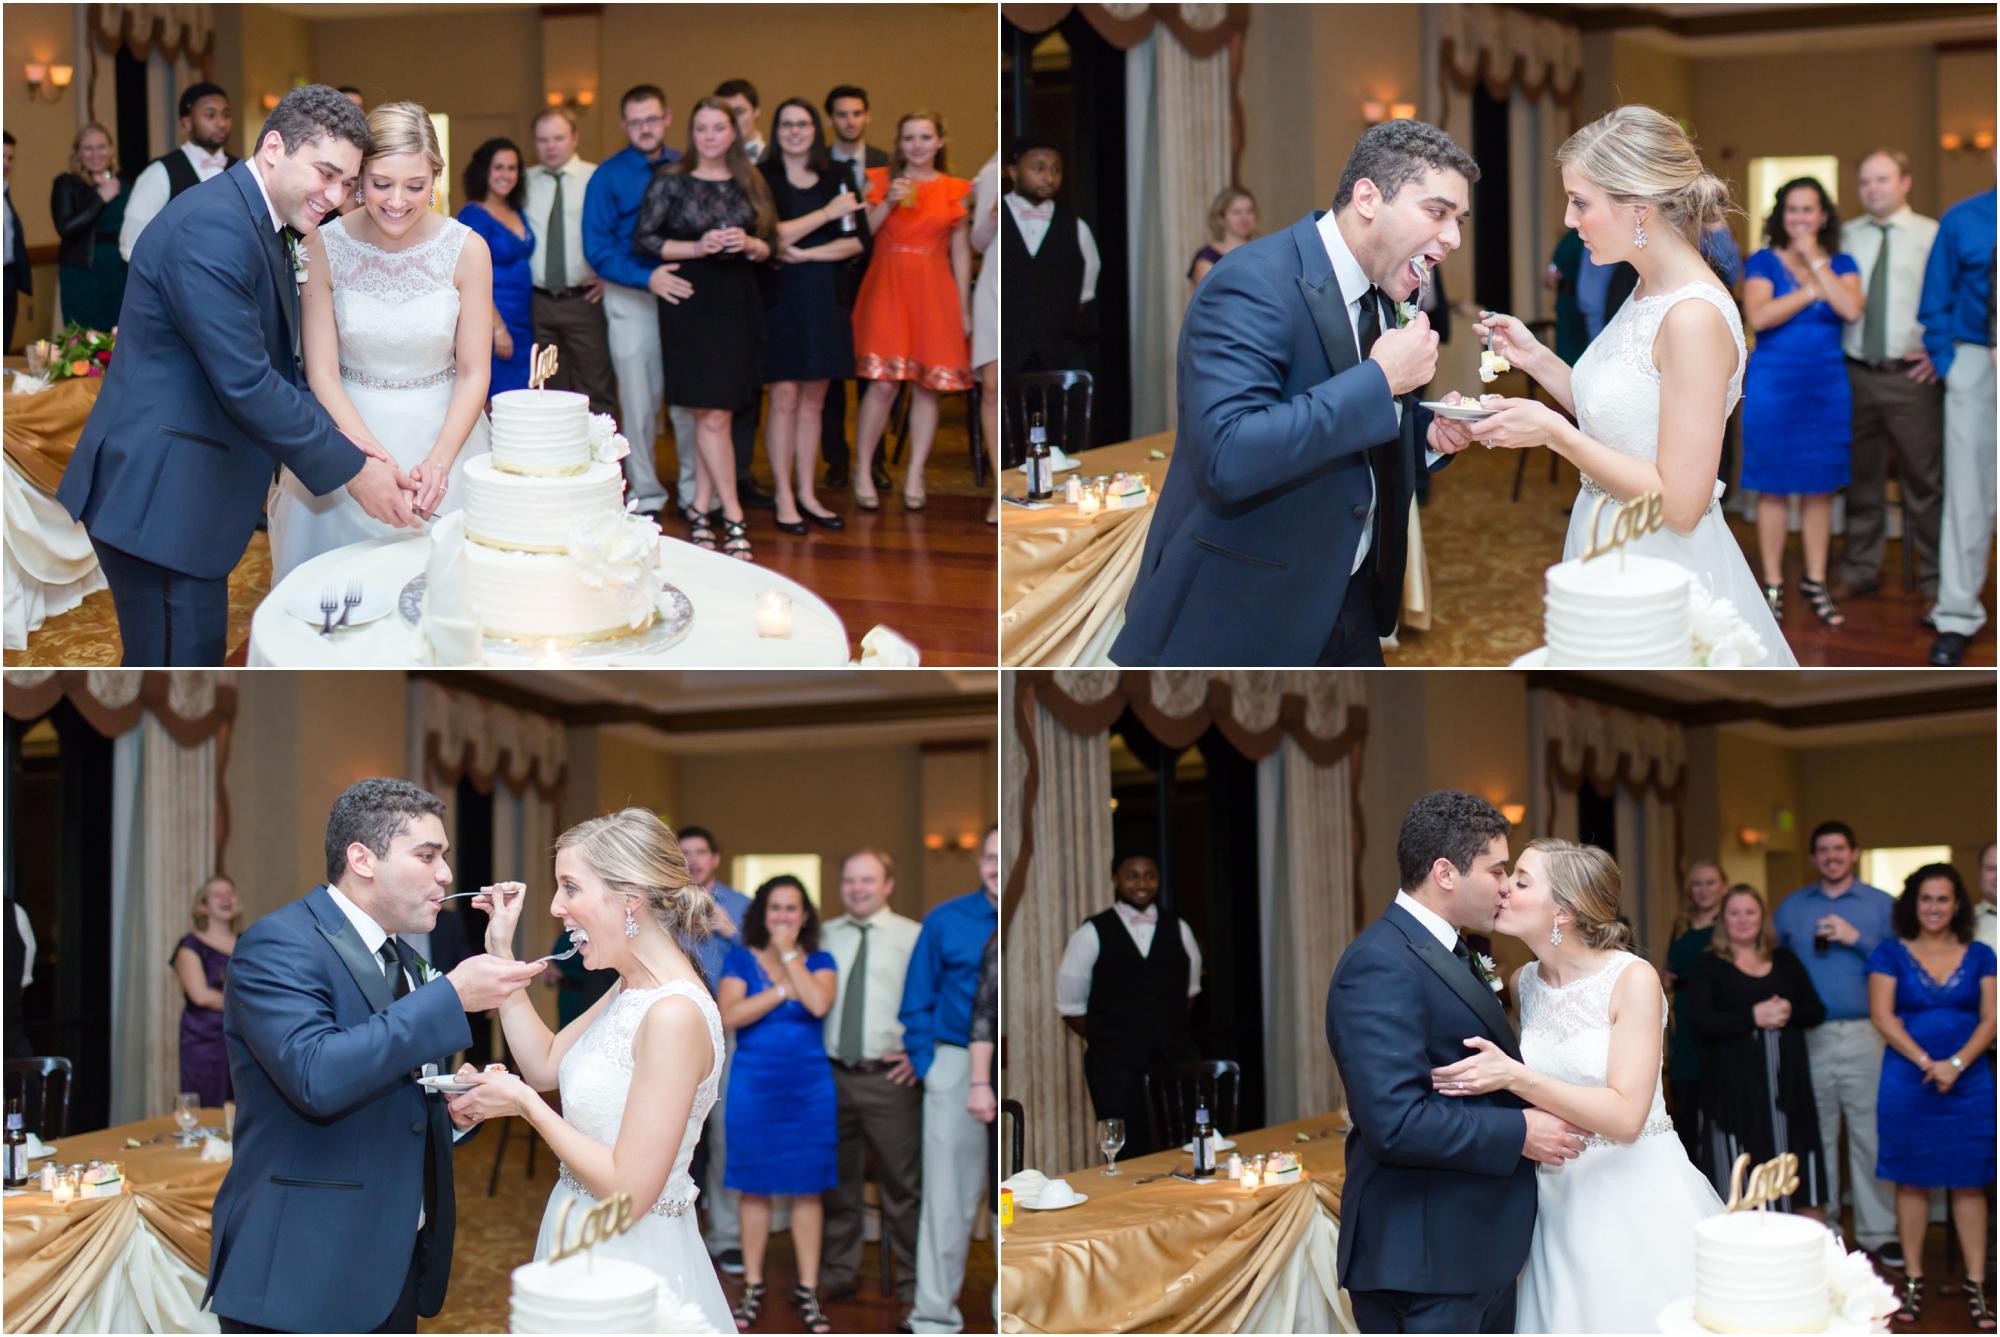 6-Finkel Wedding Reception-948_anna grace photography maryland wedding photographer turf valley.jpg